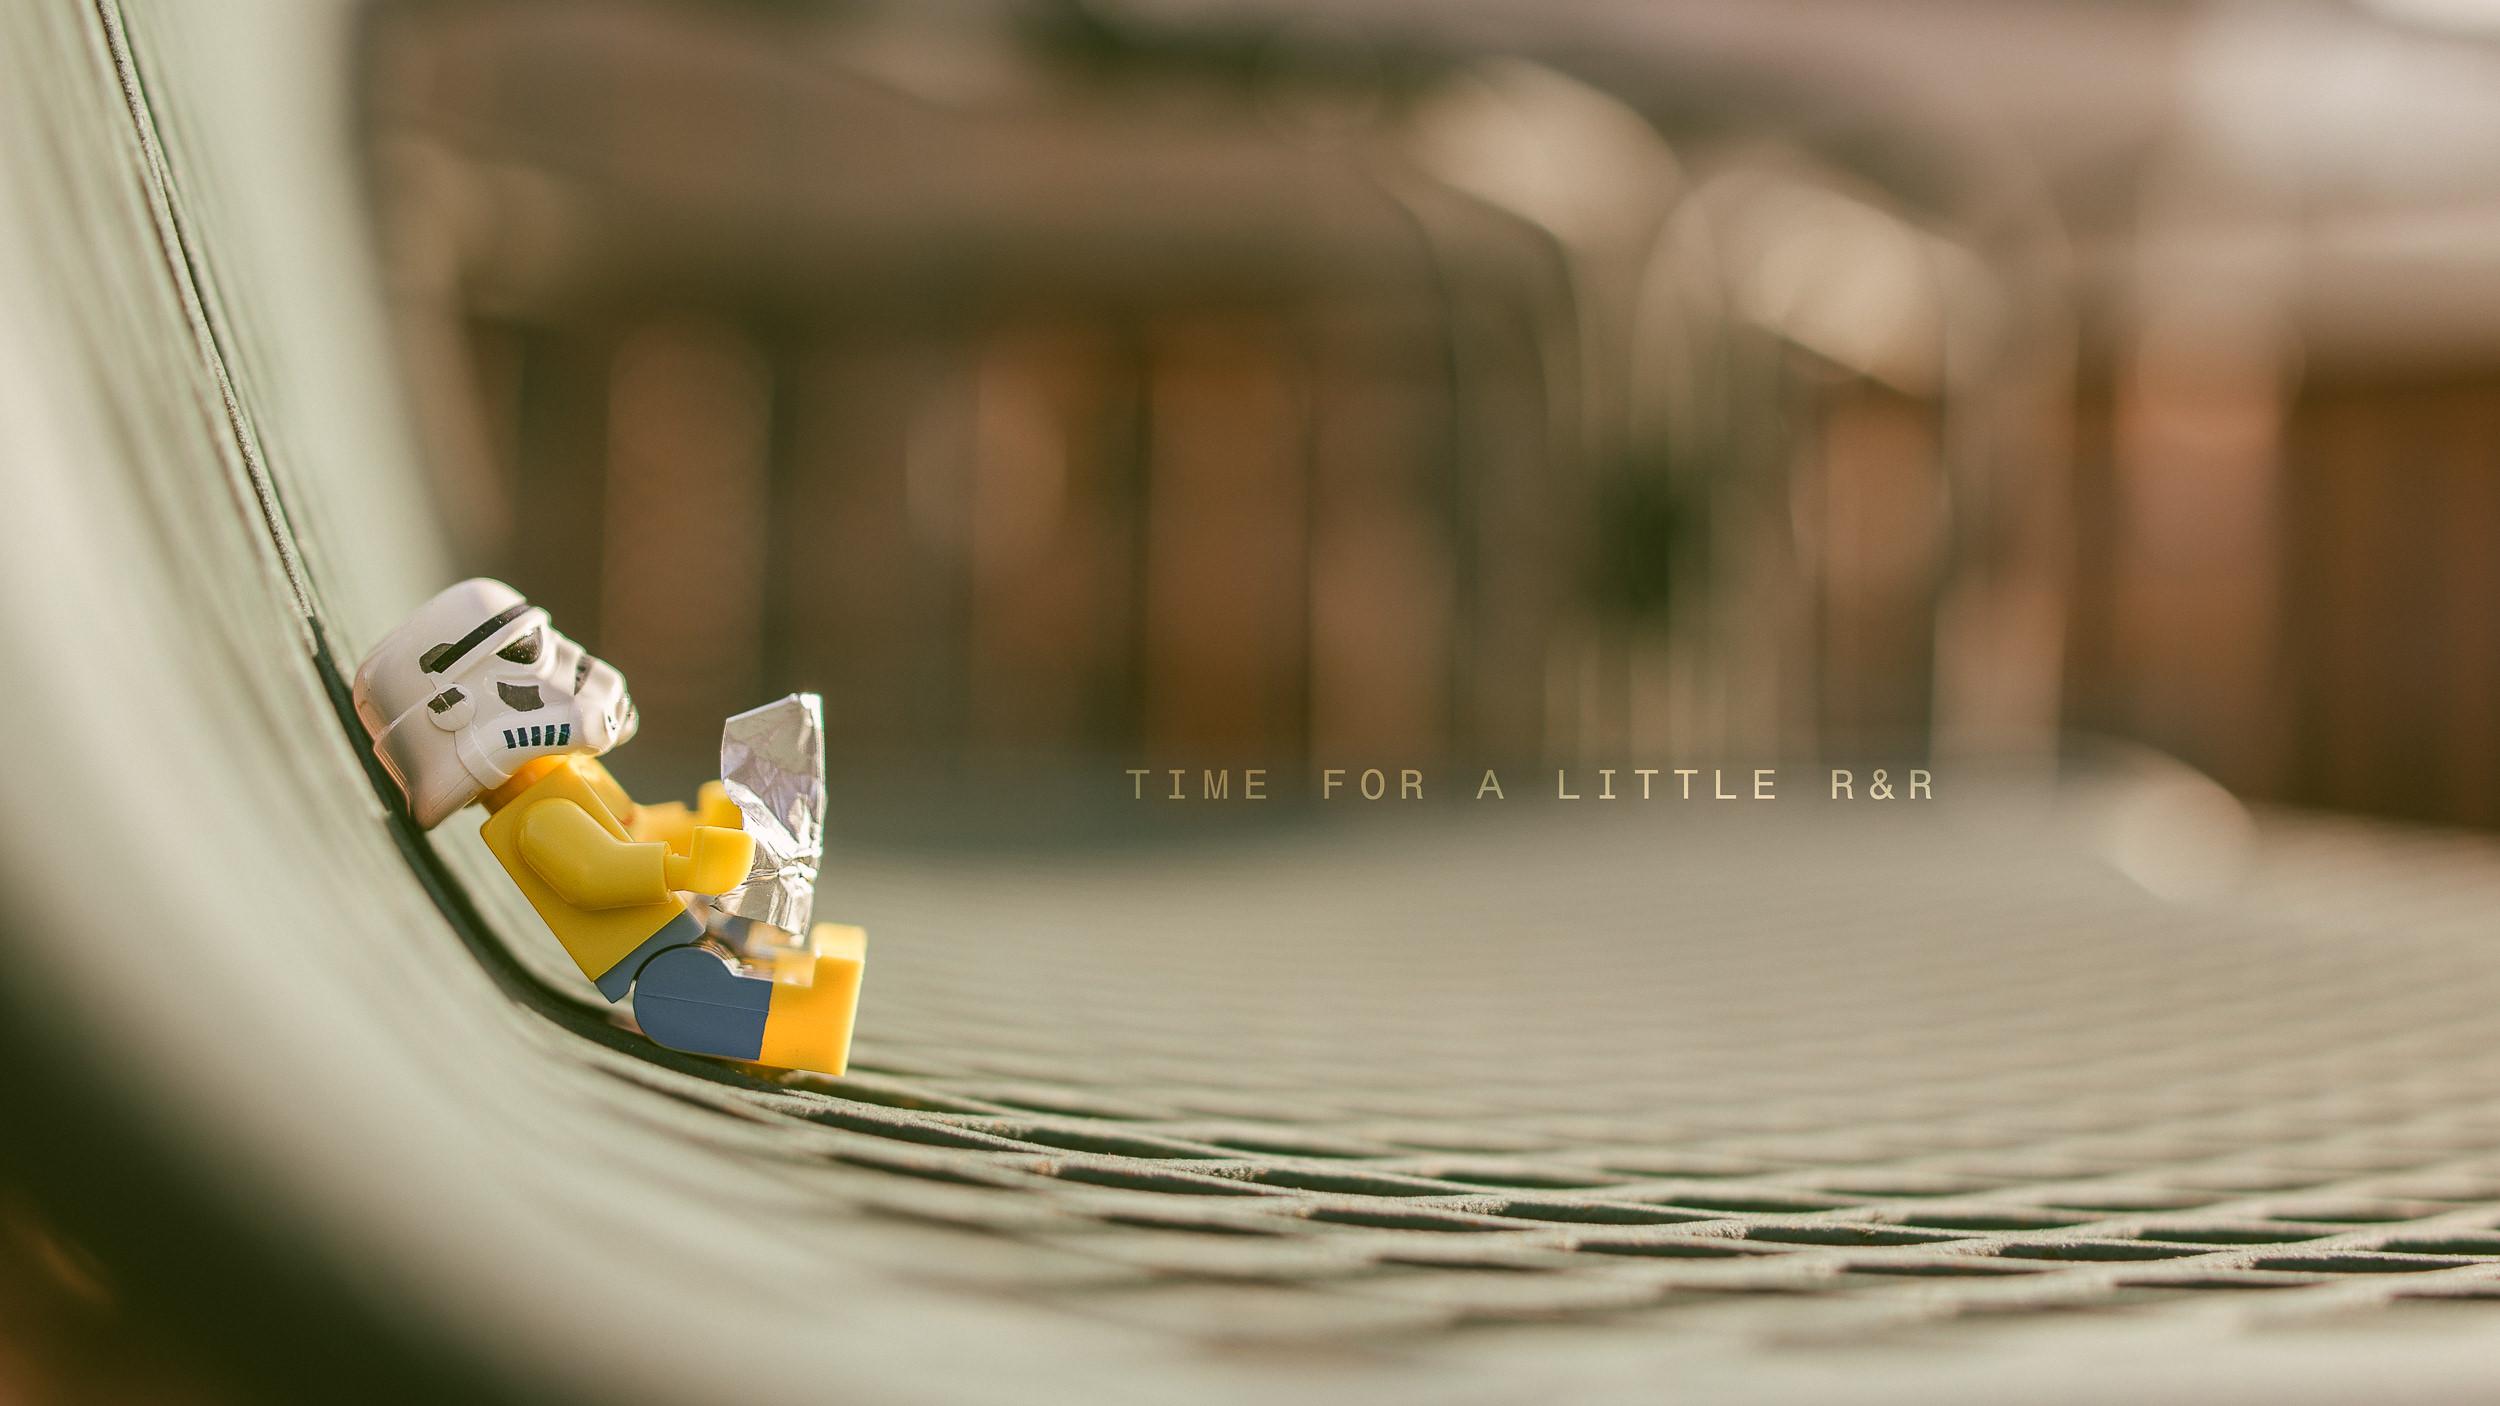 Lego-Portrait-Series-Reggie-Ballesteros-0007.jpg